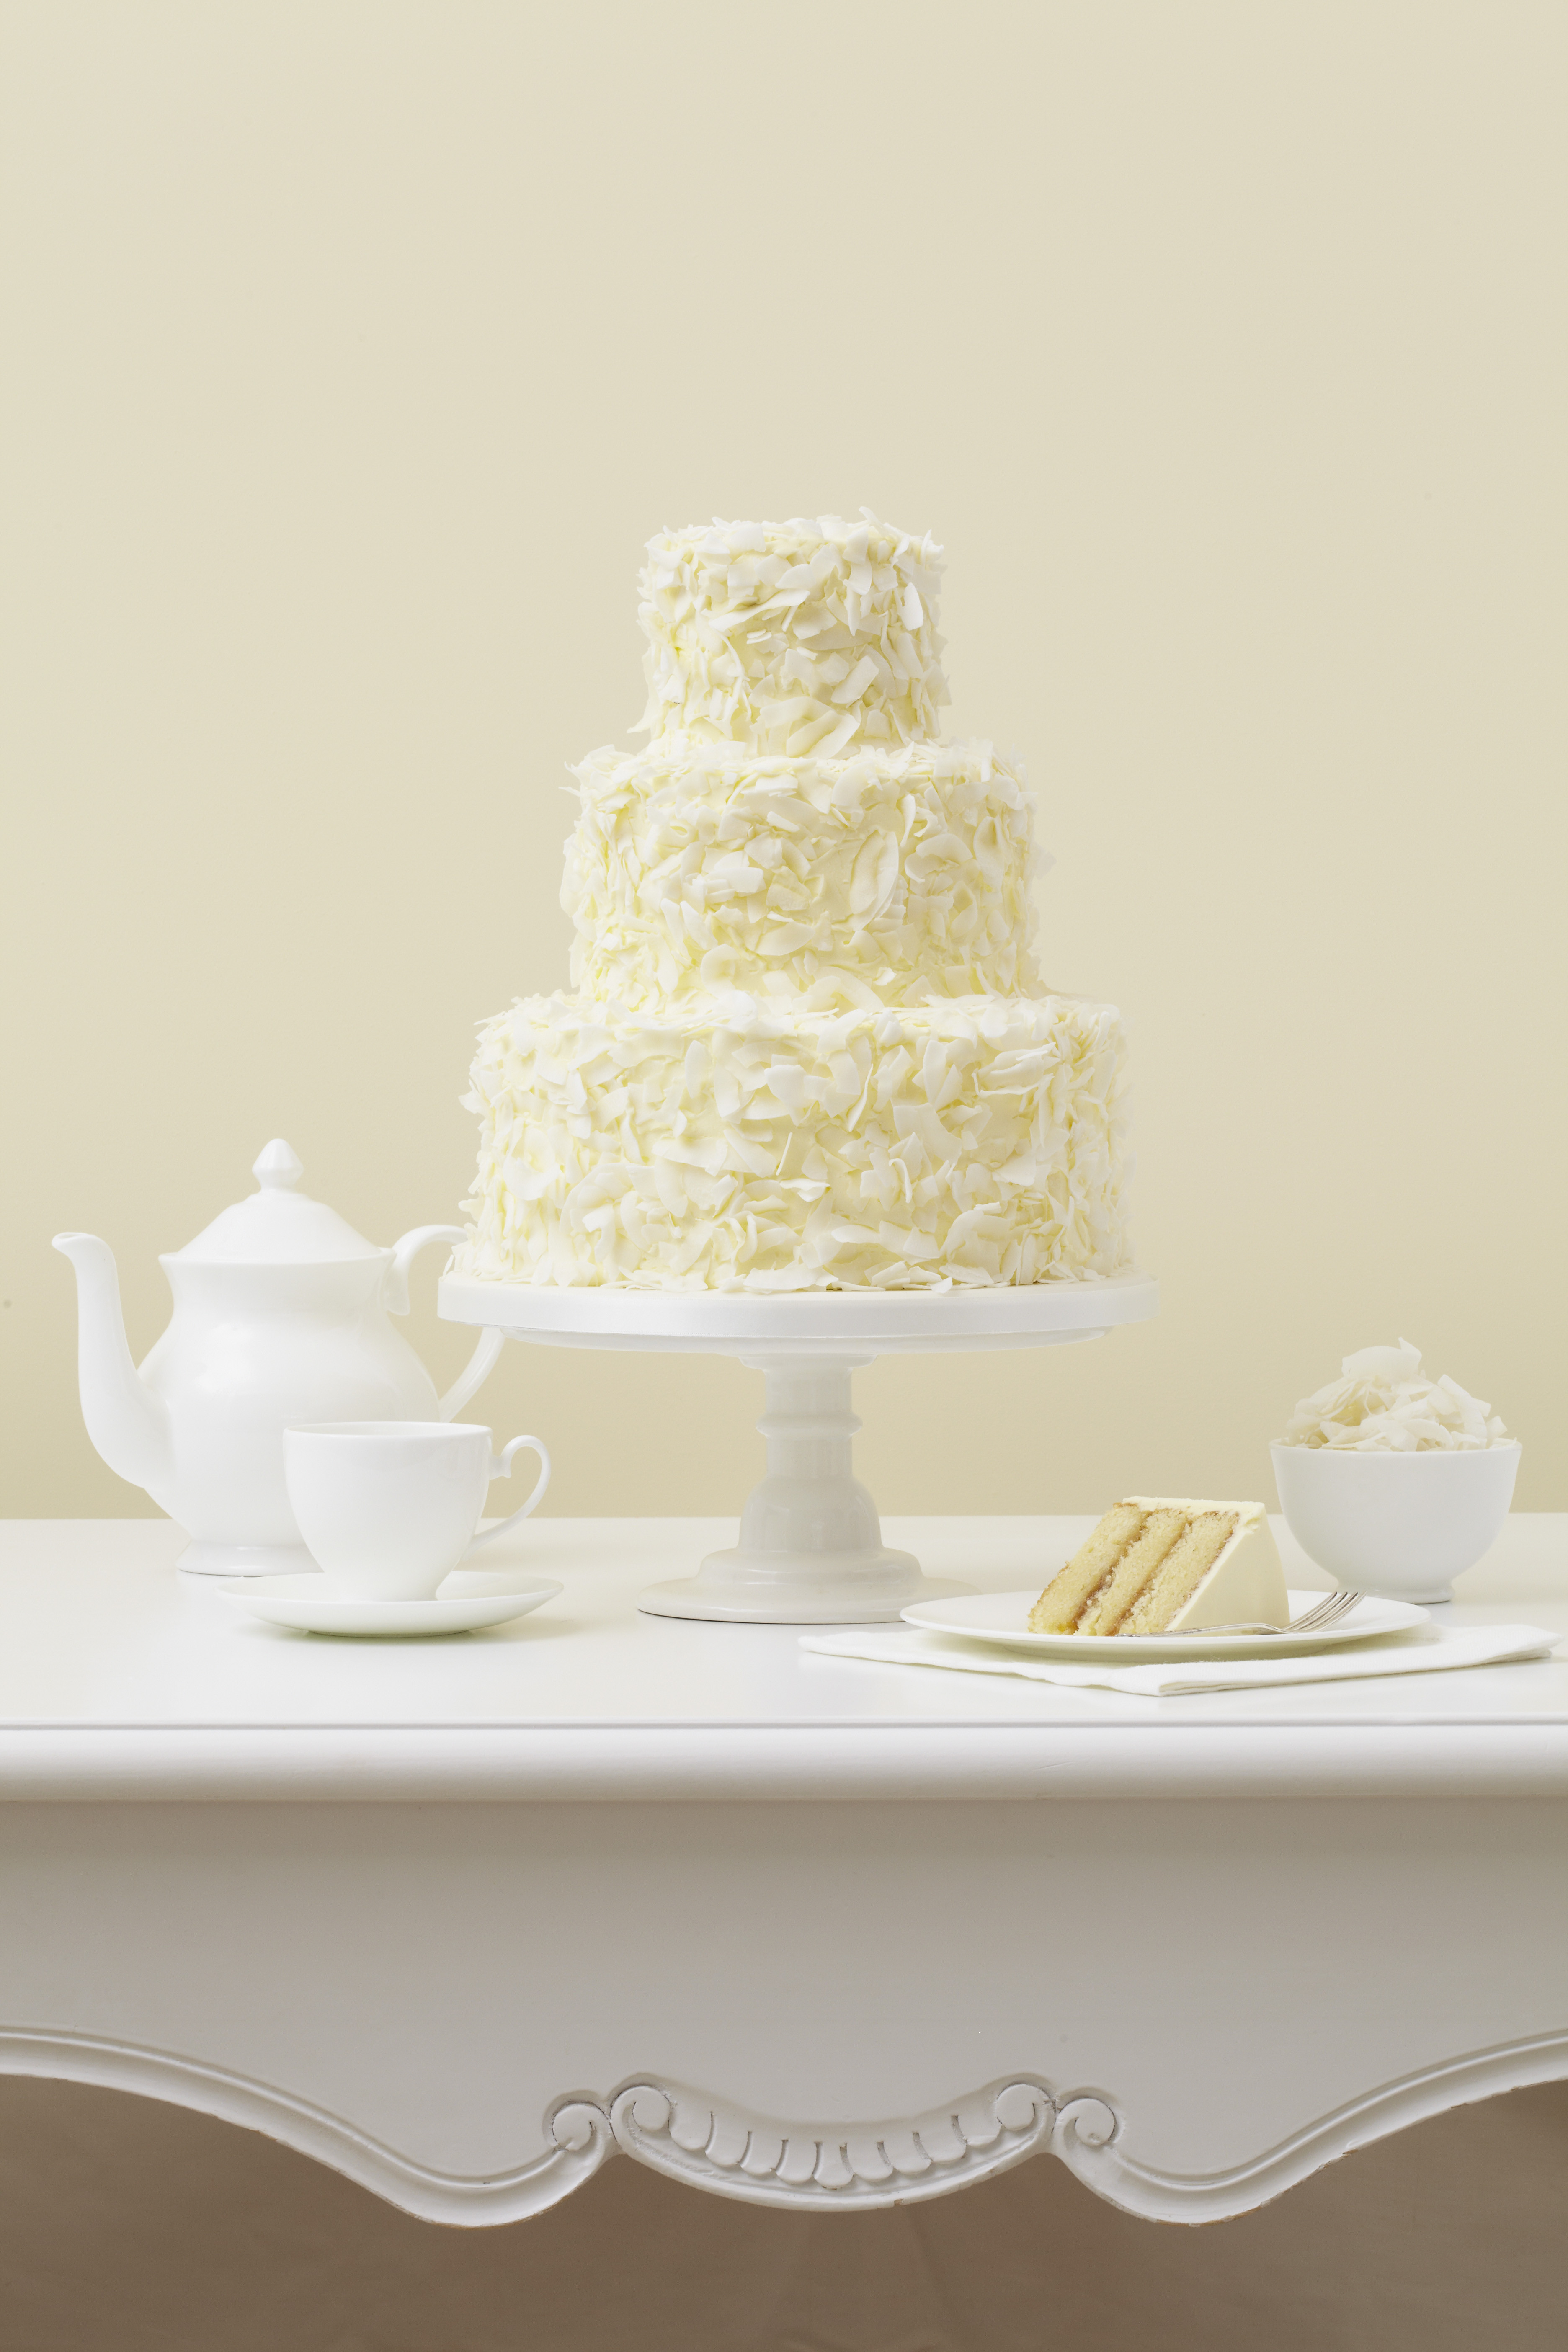 Walmart Wedding Cakes Catalog  SHOW ME YOUR WALMART WEDDING CAKE